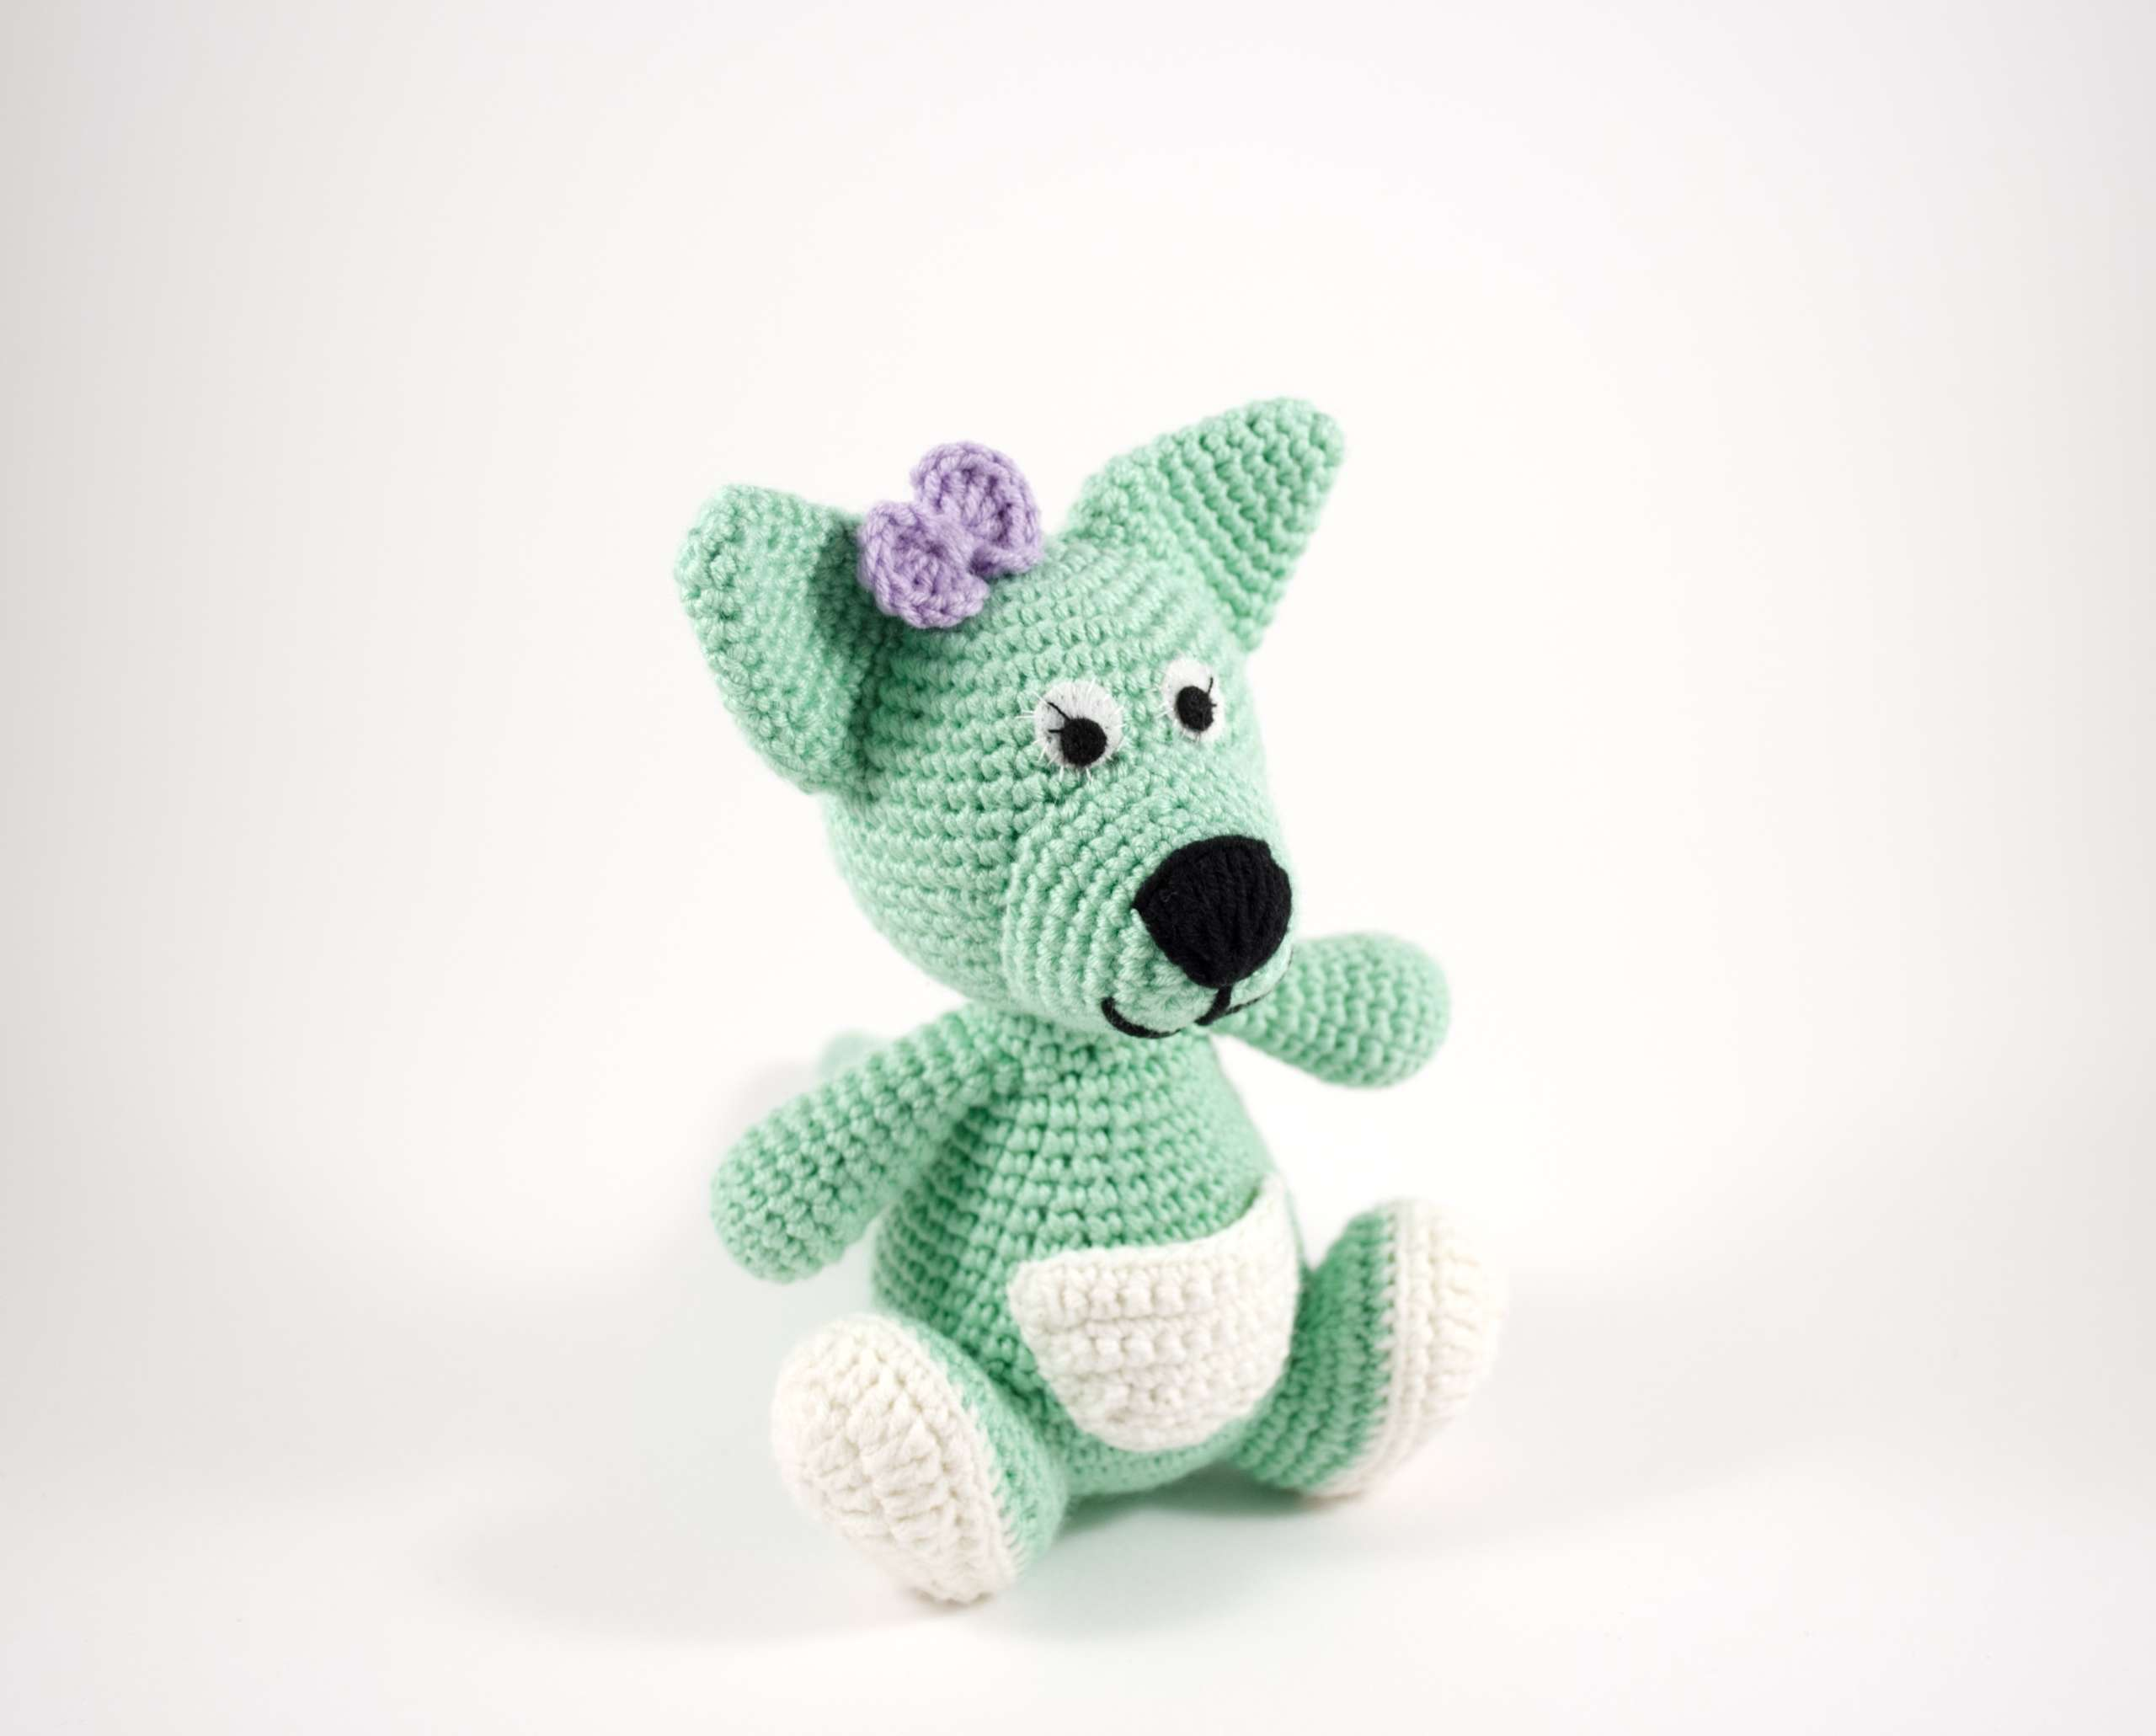 crochet chloe the kangaroo